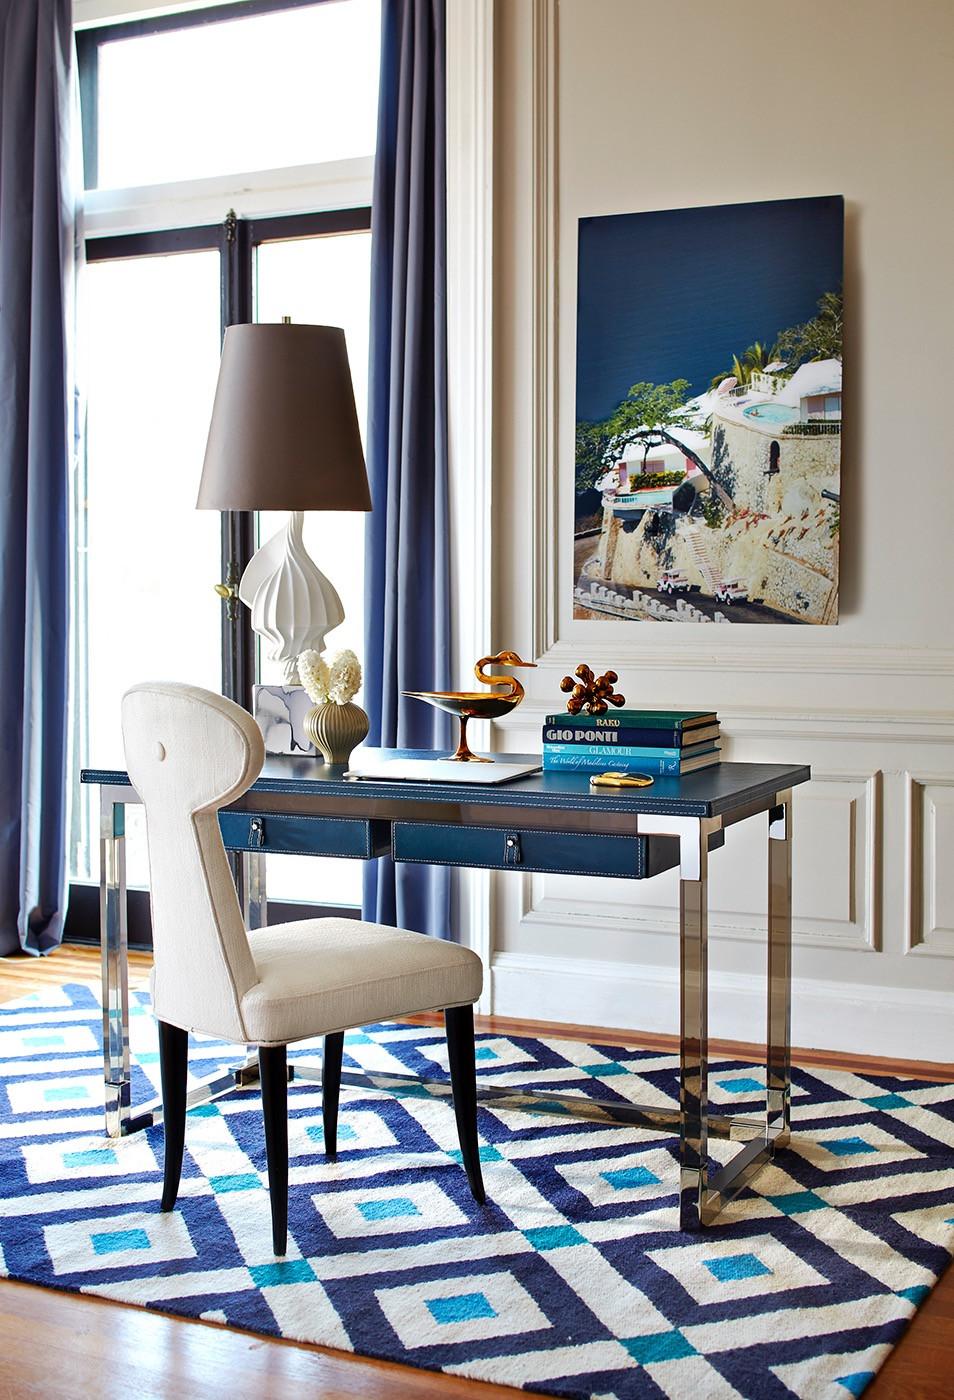 Jonathan Adler interior design geometric